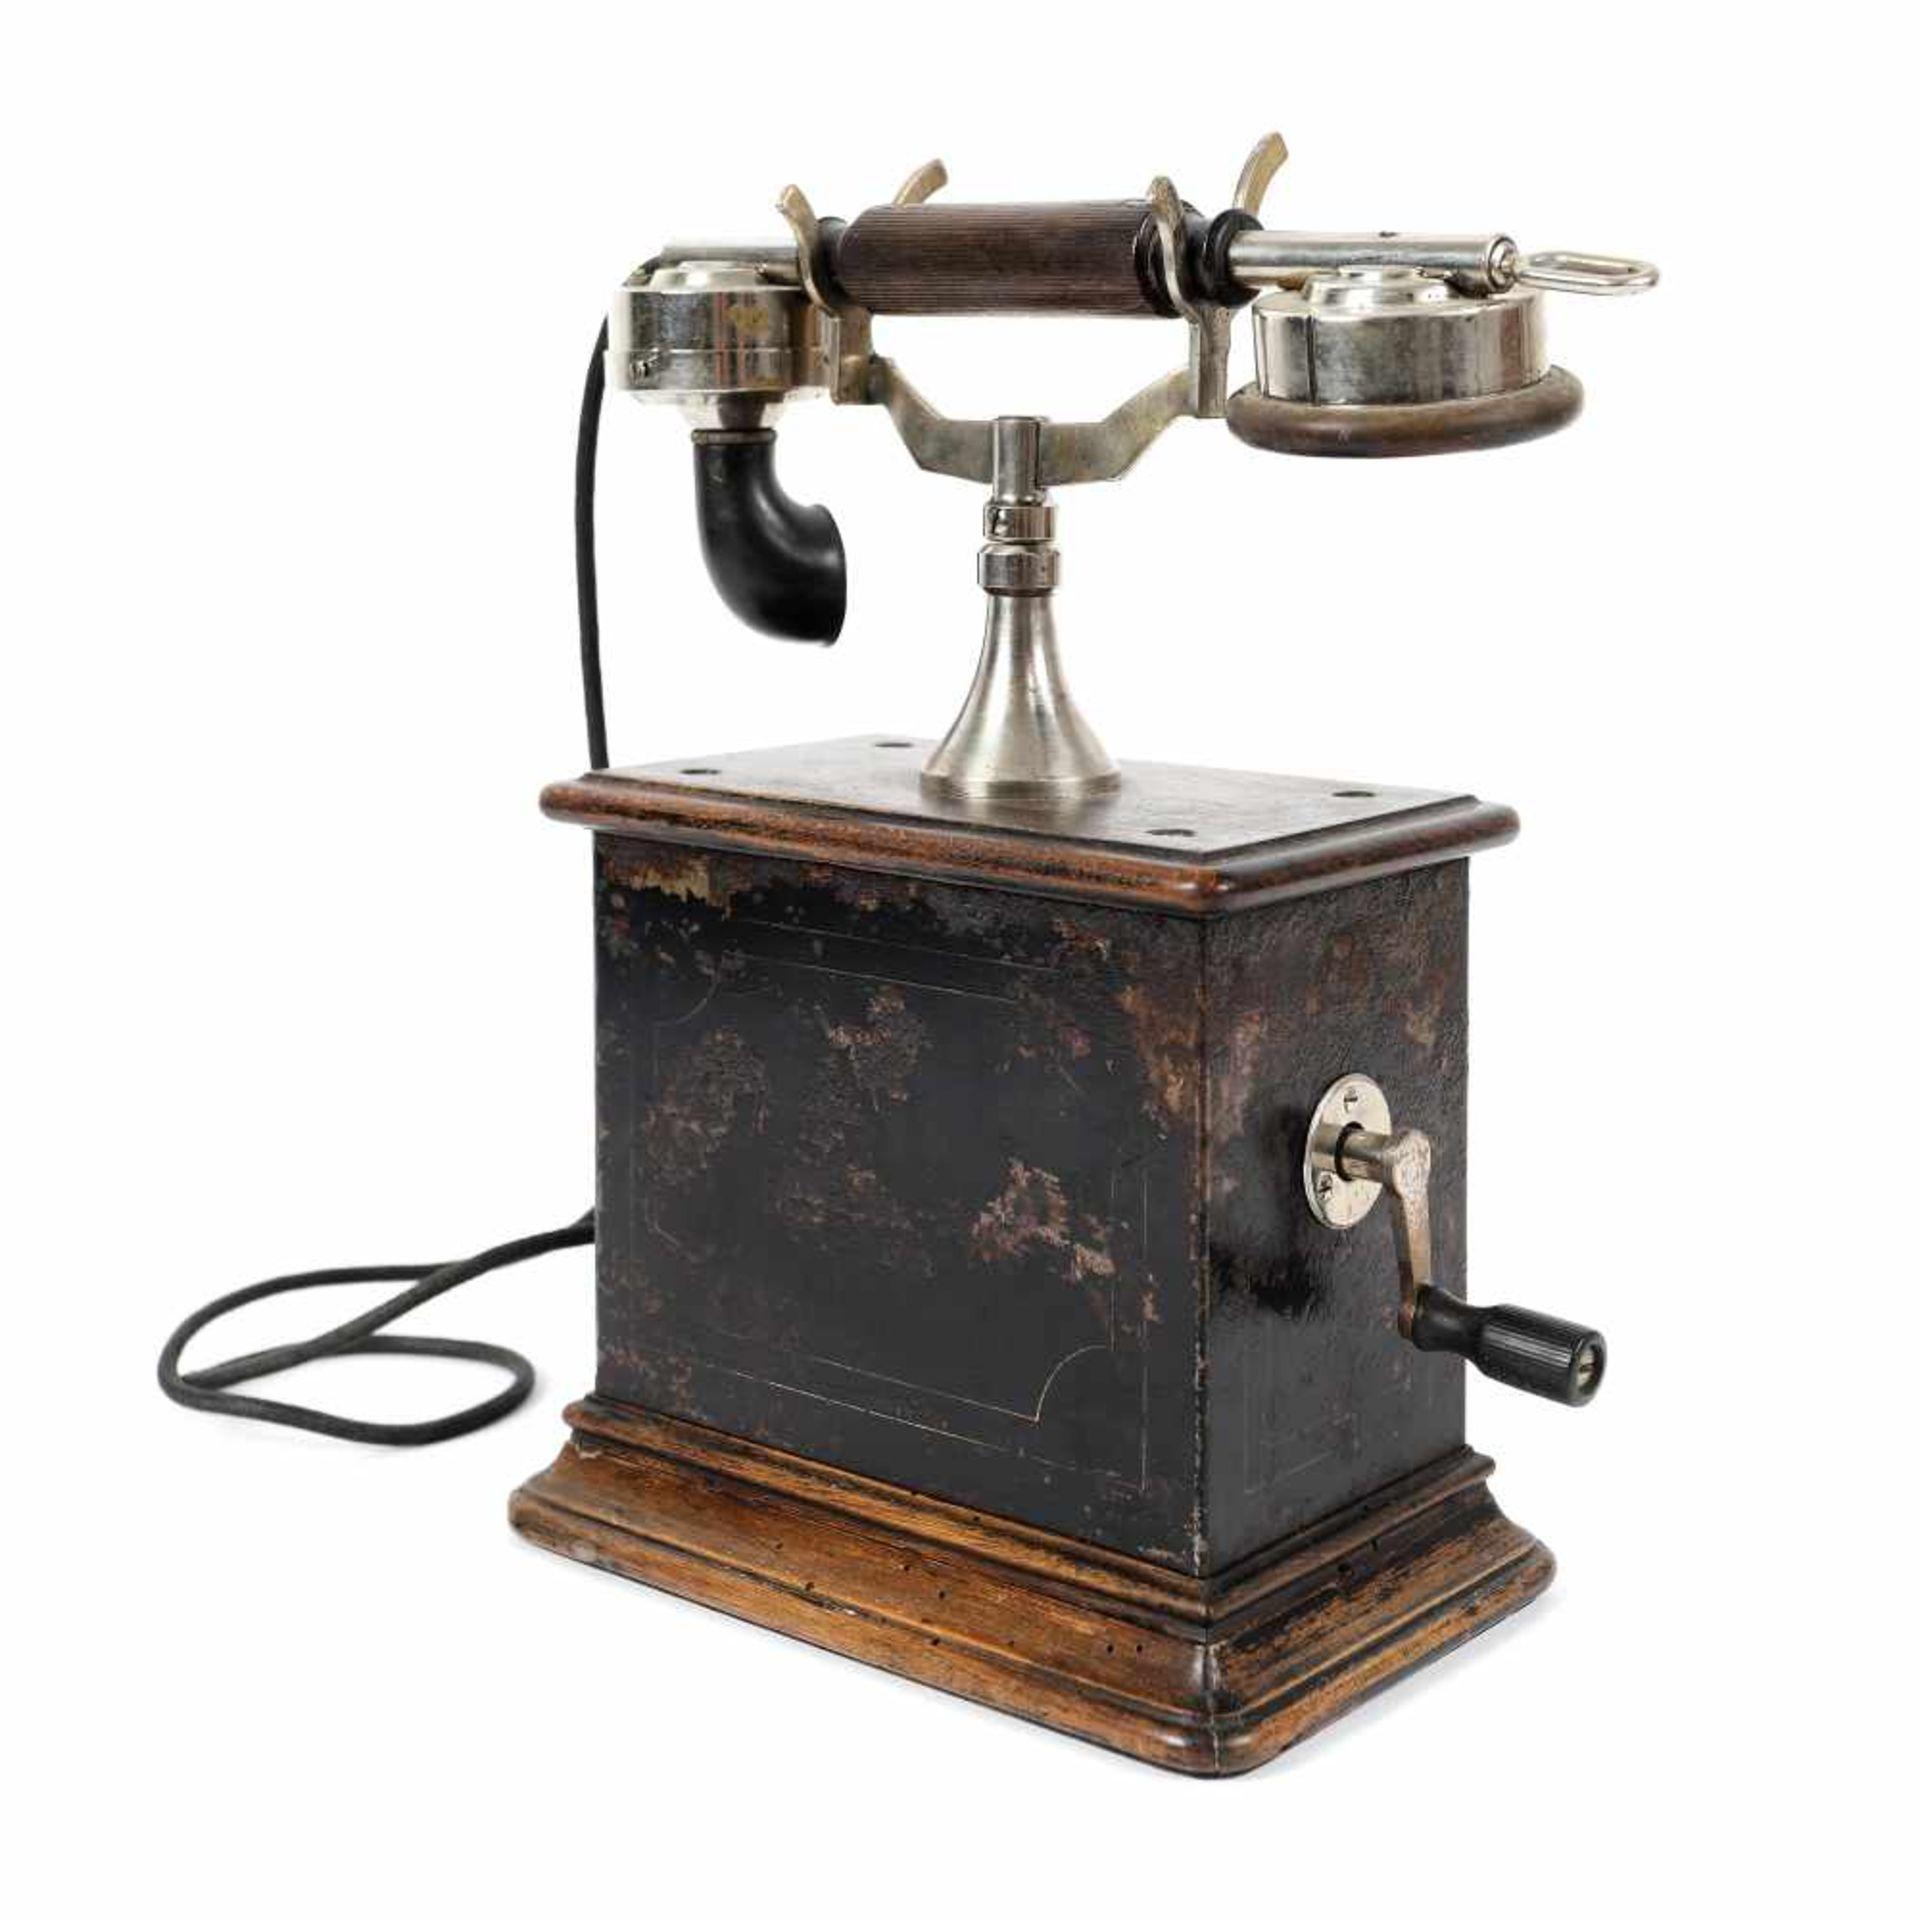 Office phone, early 20th century - Bild 2 aus 2